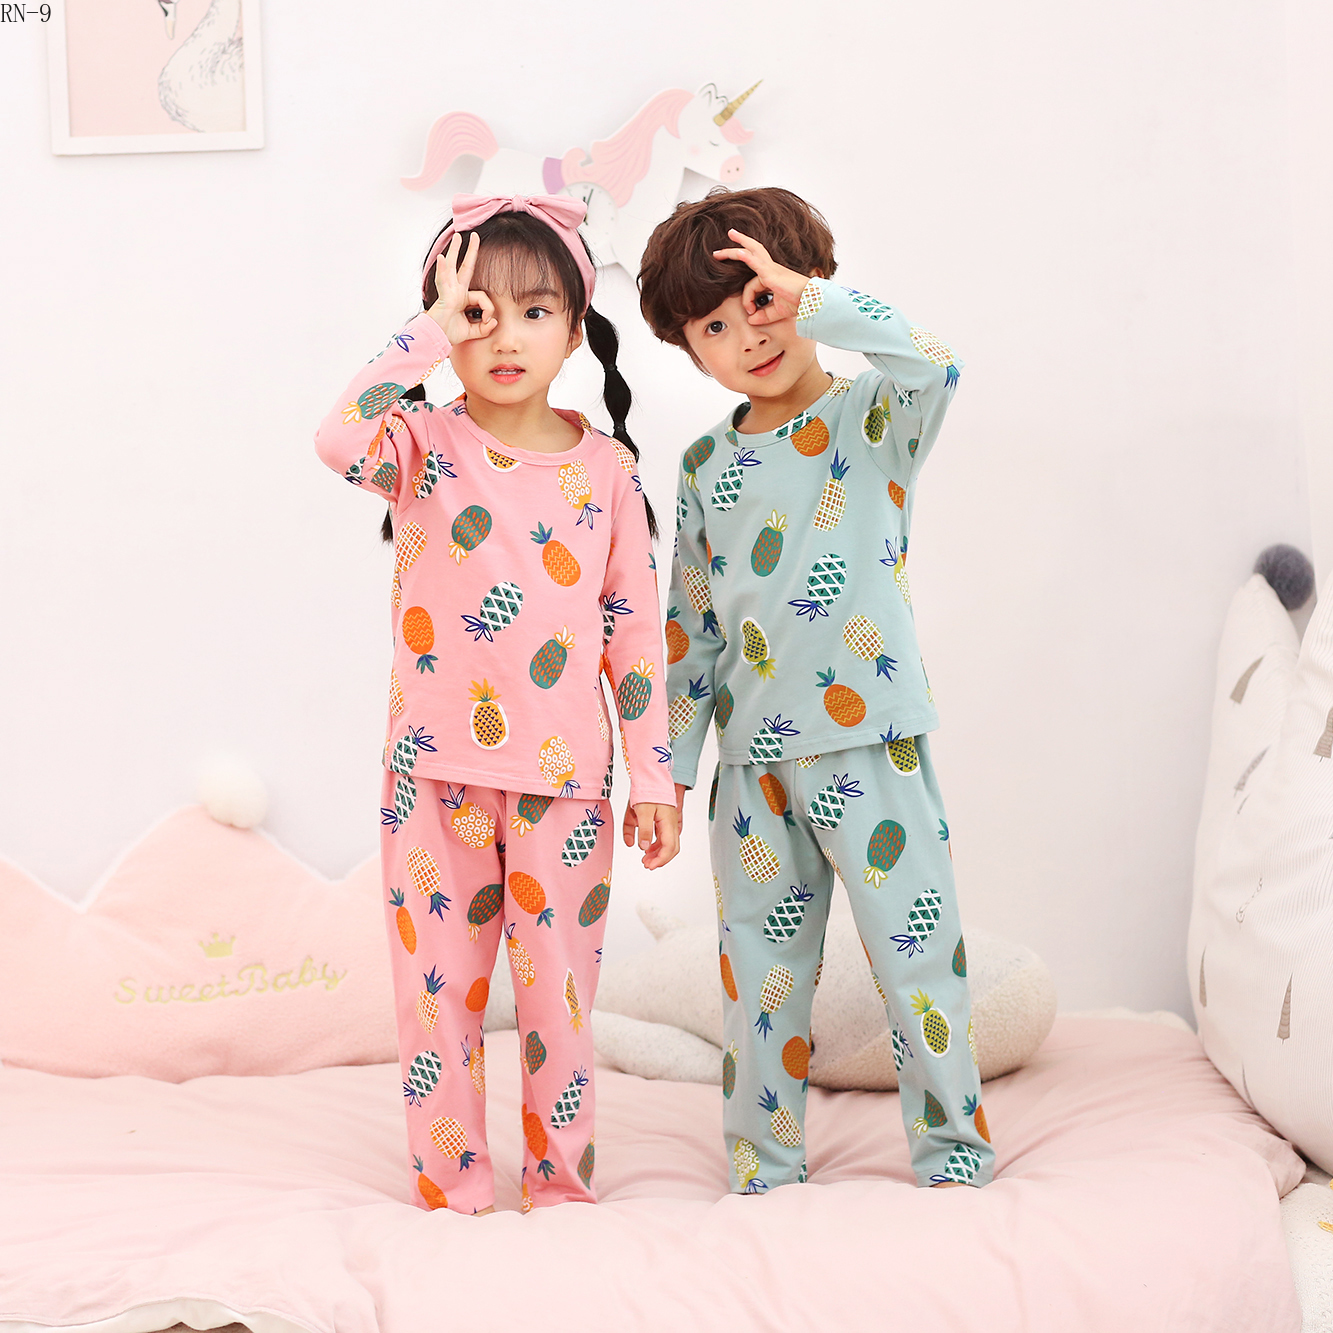 New 2019 Autumn Children Cotton Long Sleeve   Pajamas   Boy Warm Sleepwear Baby Nightwear Kids Lovely Underwear Girls Pyjamas   Set